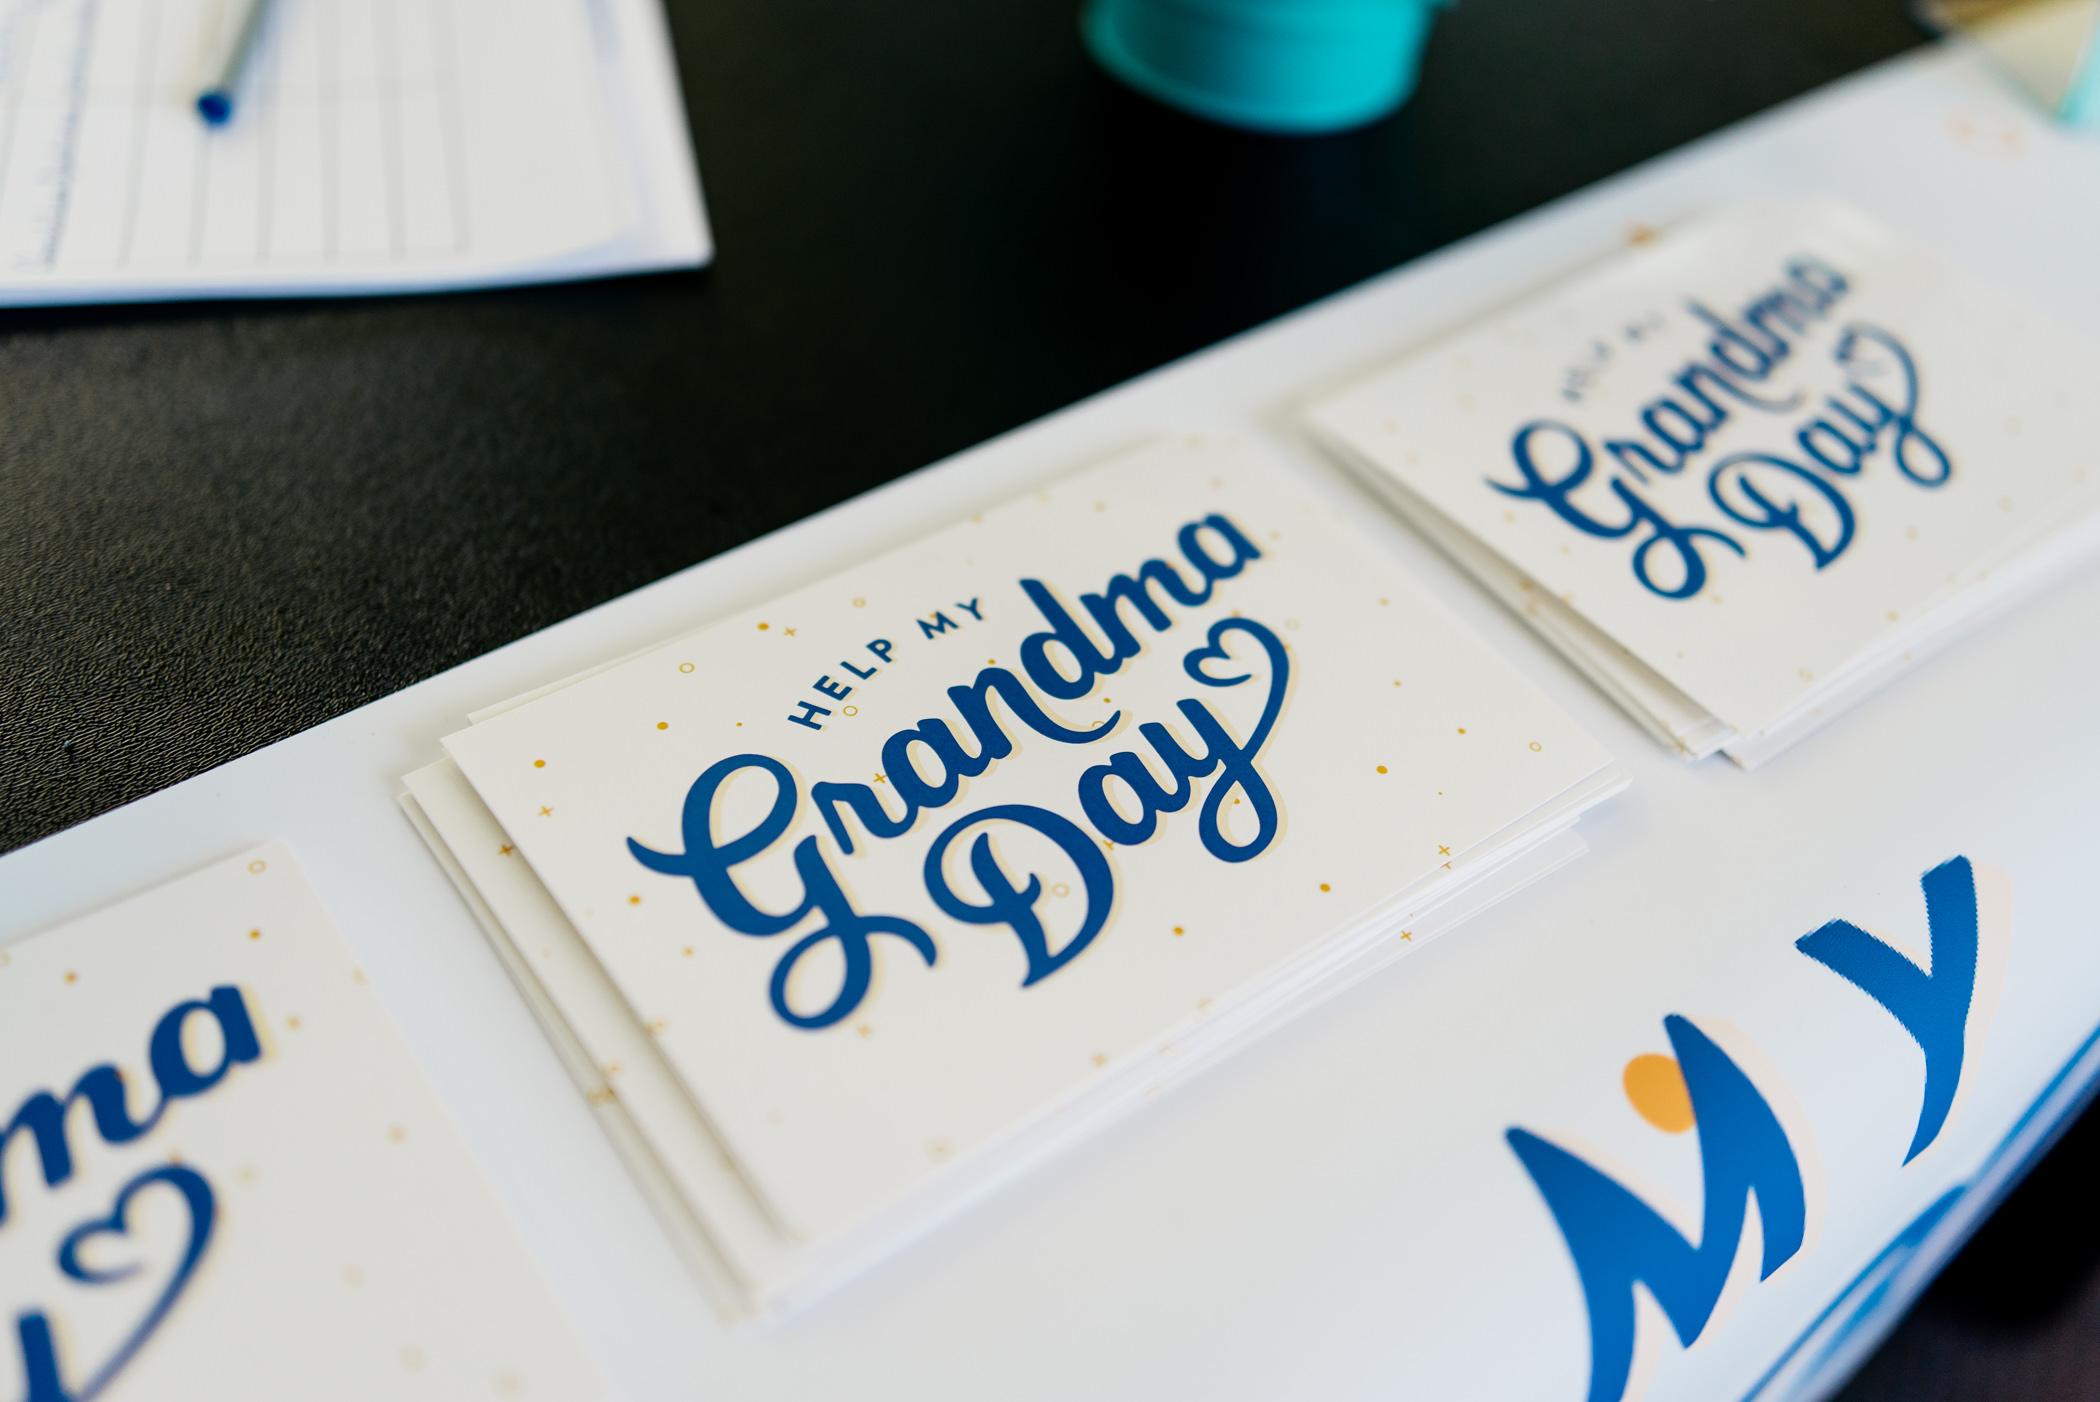 Digital_Health_Group-Help_My_Grandma_Day-WEB-Launch Cards.JPG